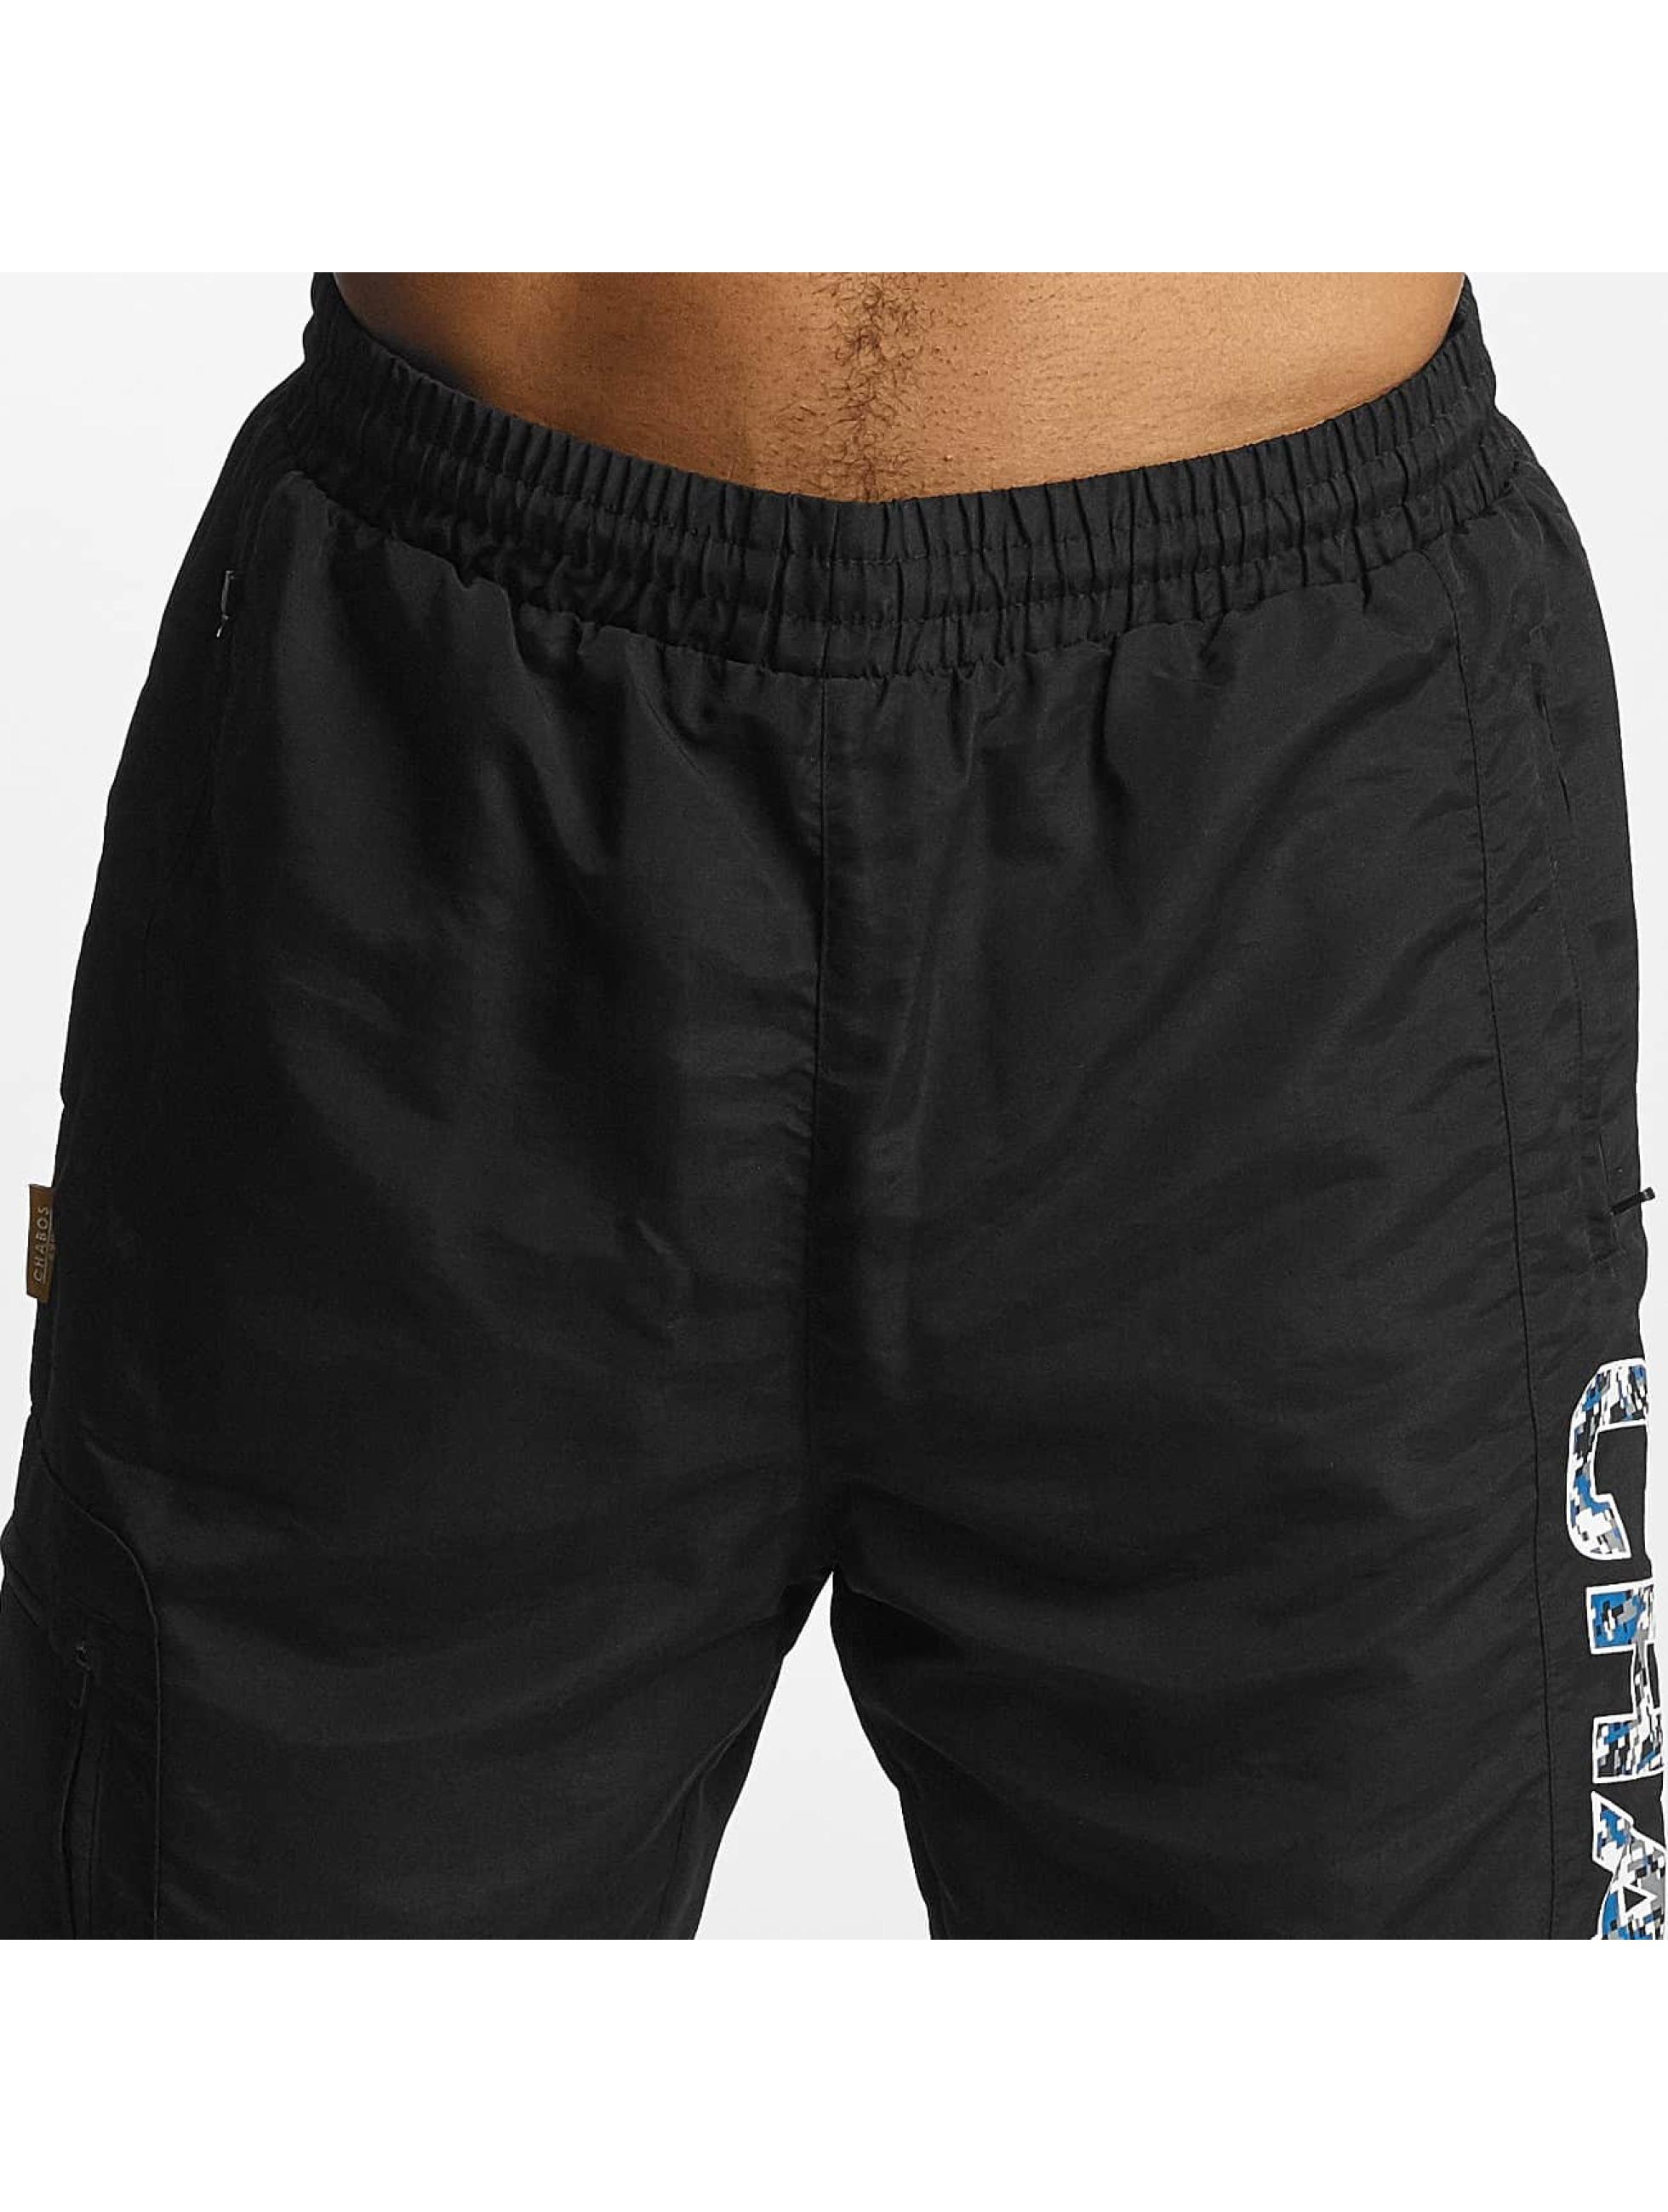 CHABOS IIVII Pantalón deportivo Pafpaf negro